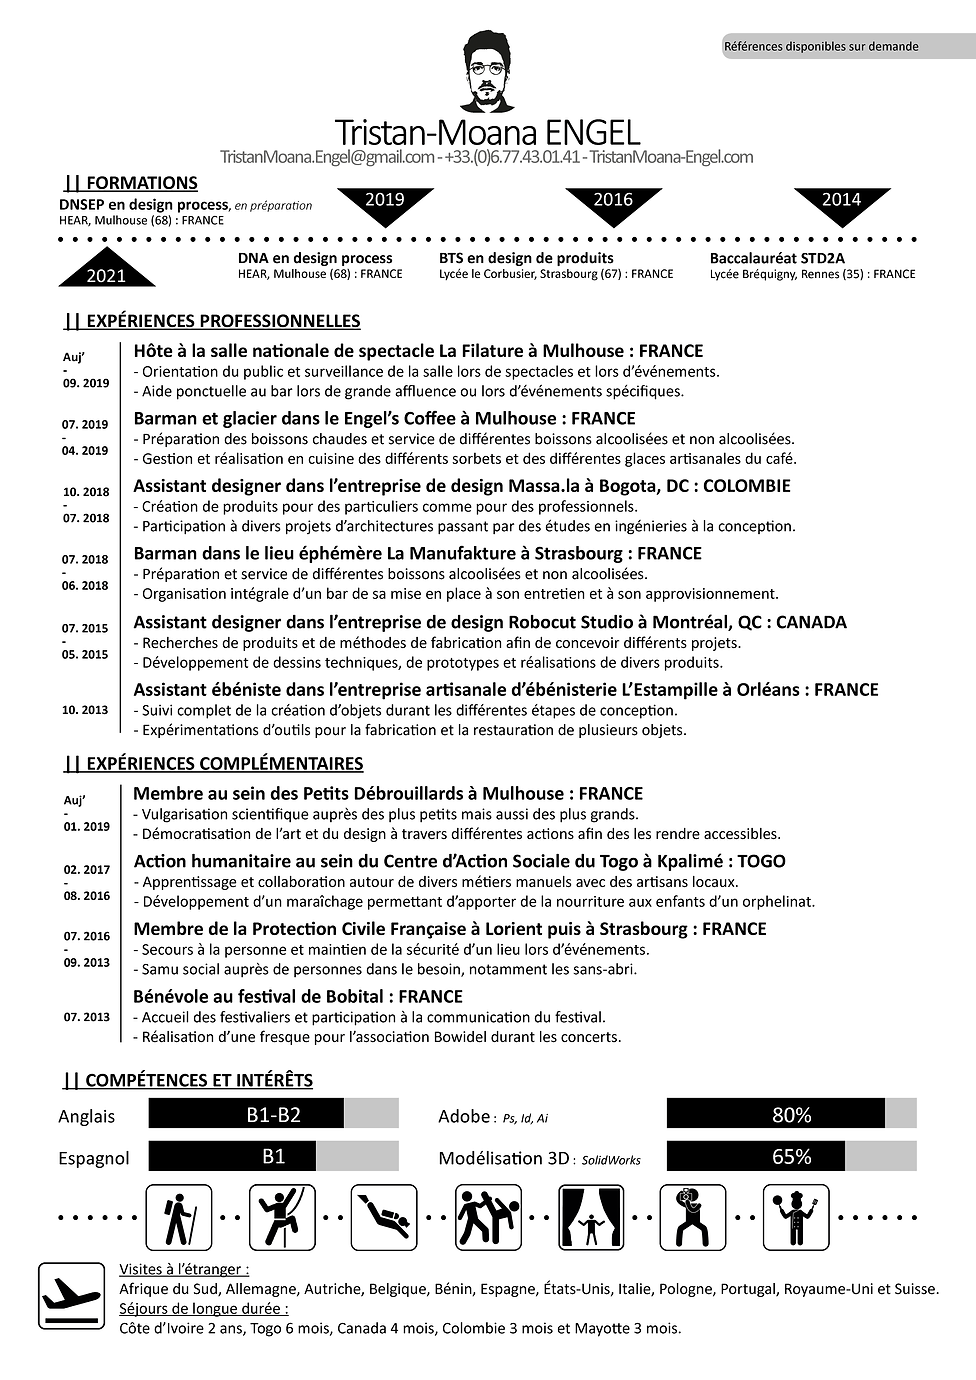 Tristan-Moana ENGEL CV-FR.png